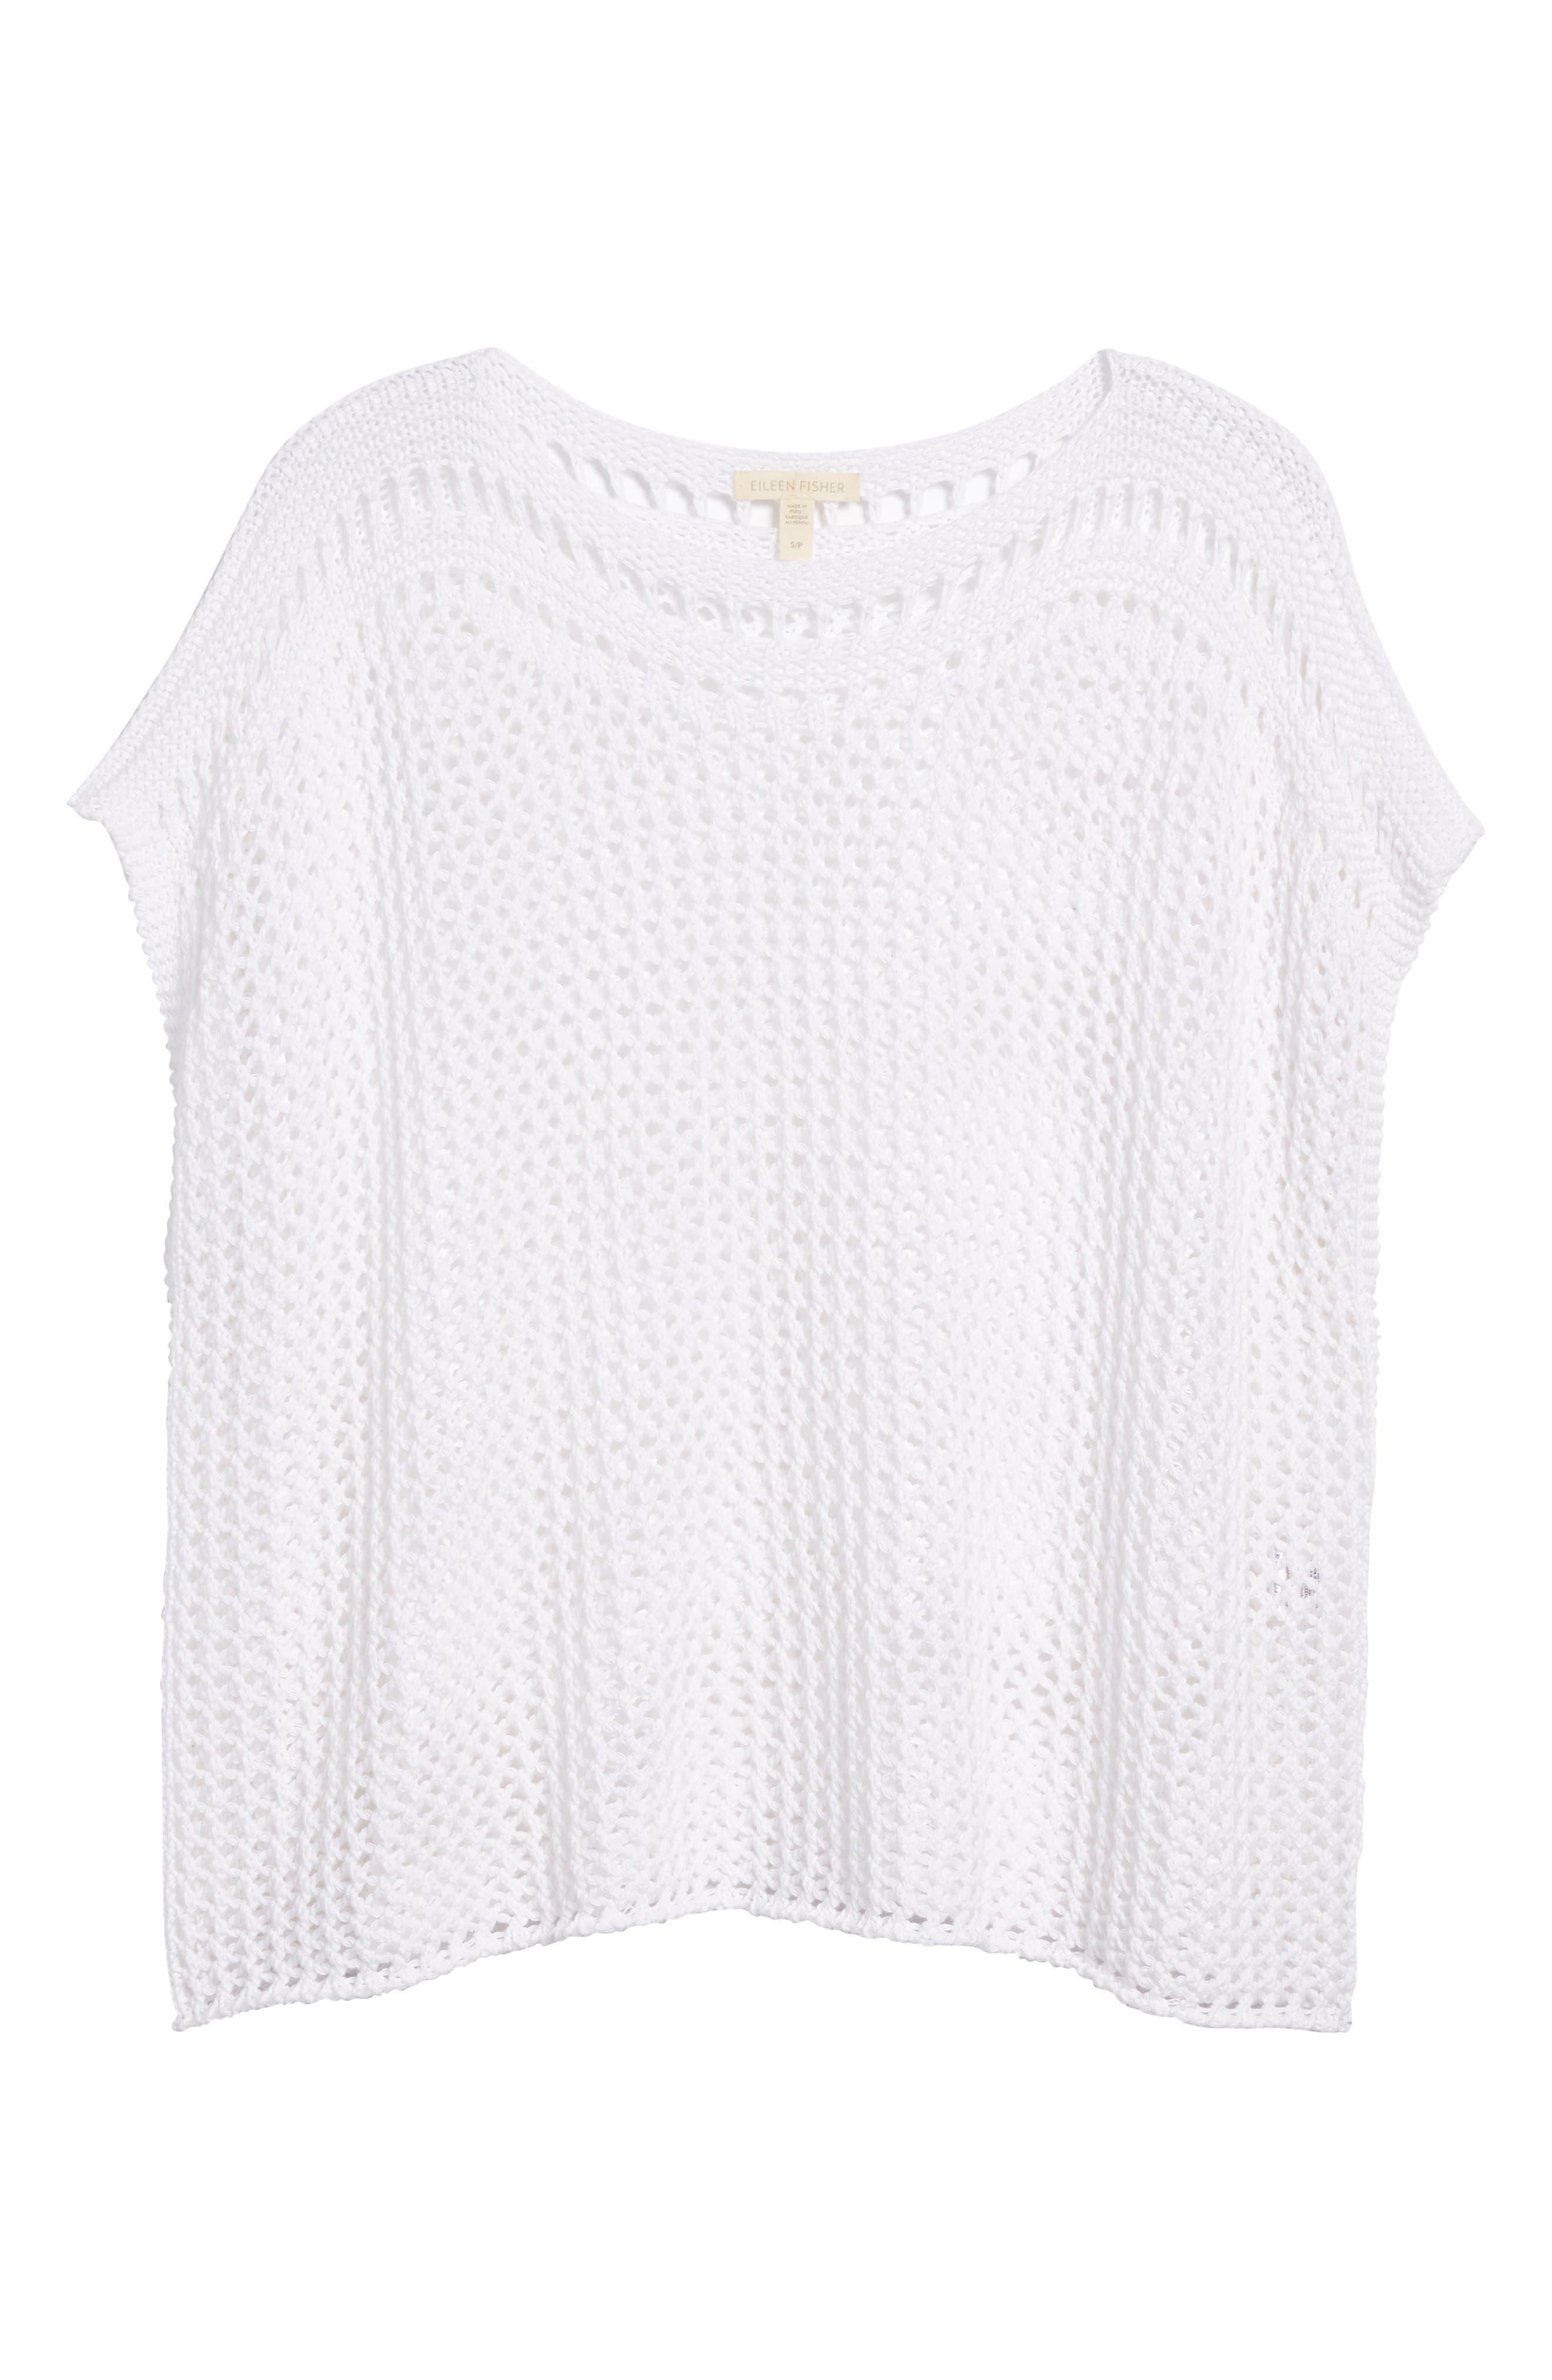 Organic Cotton Sweater,                             Alternate thumbnail 6, color,                             White